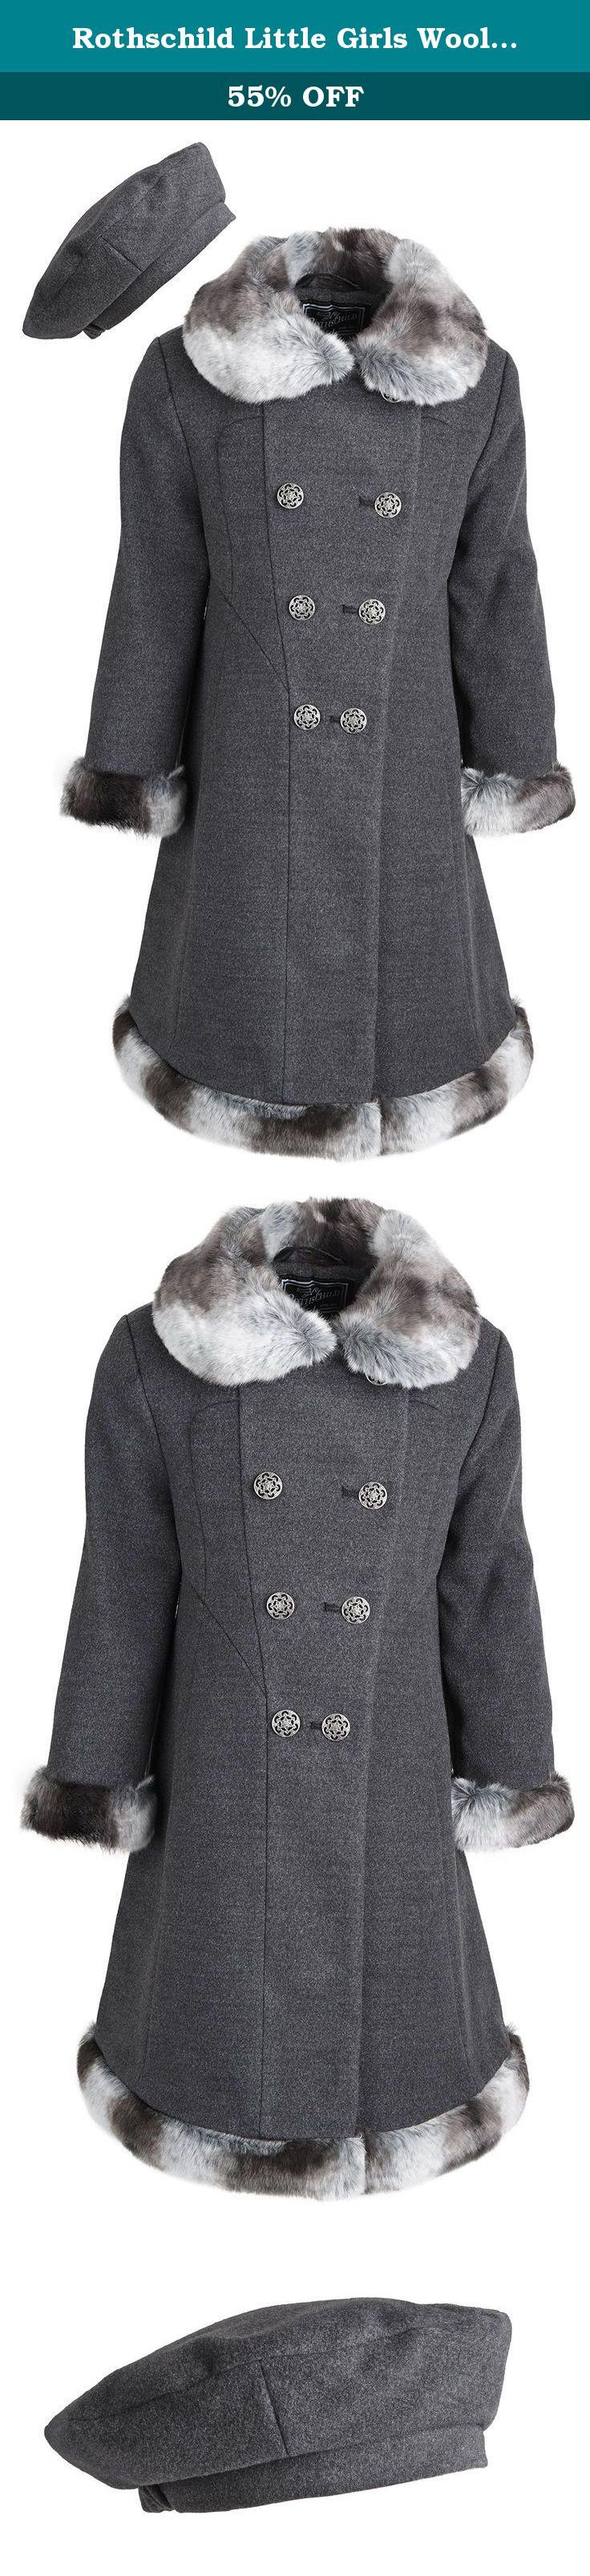 Pin On Dress Coats Jackets Coats Clothing Girls Clothing Shoes Jewelry [ 3214 x 736 Pixel ]